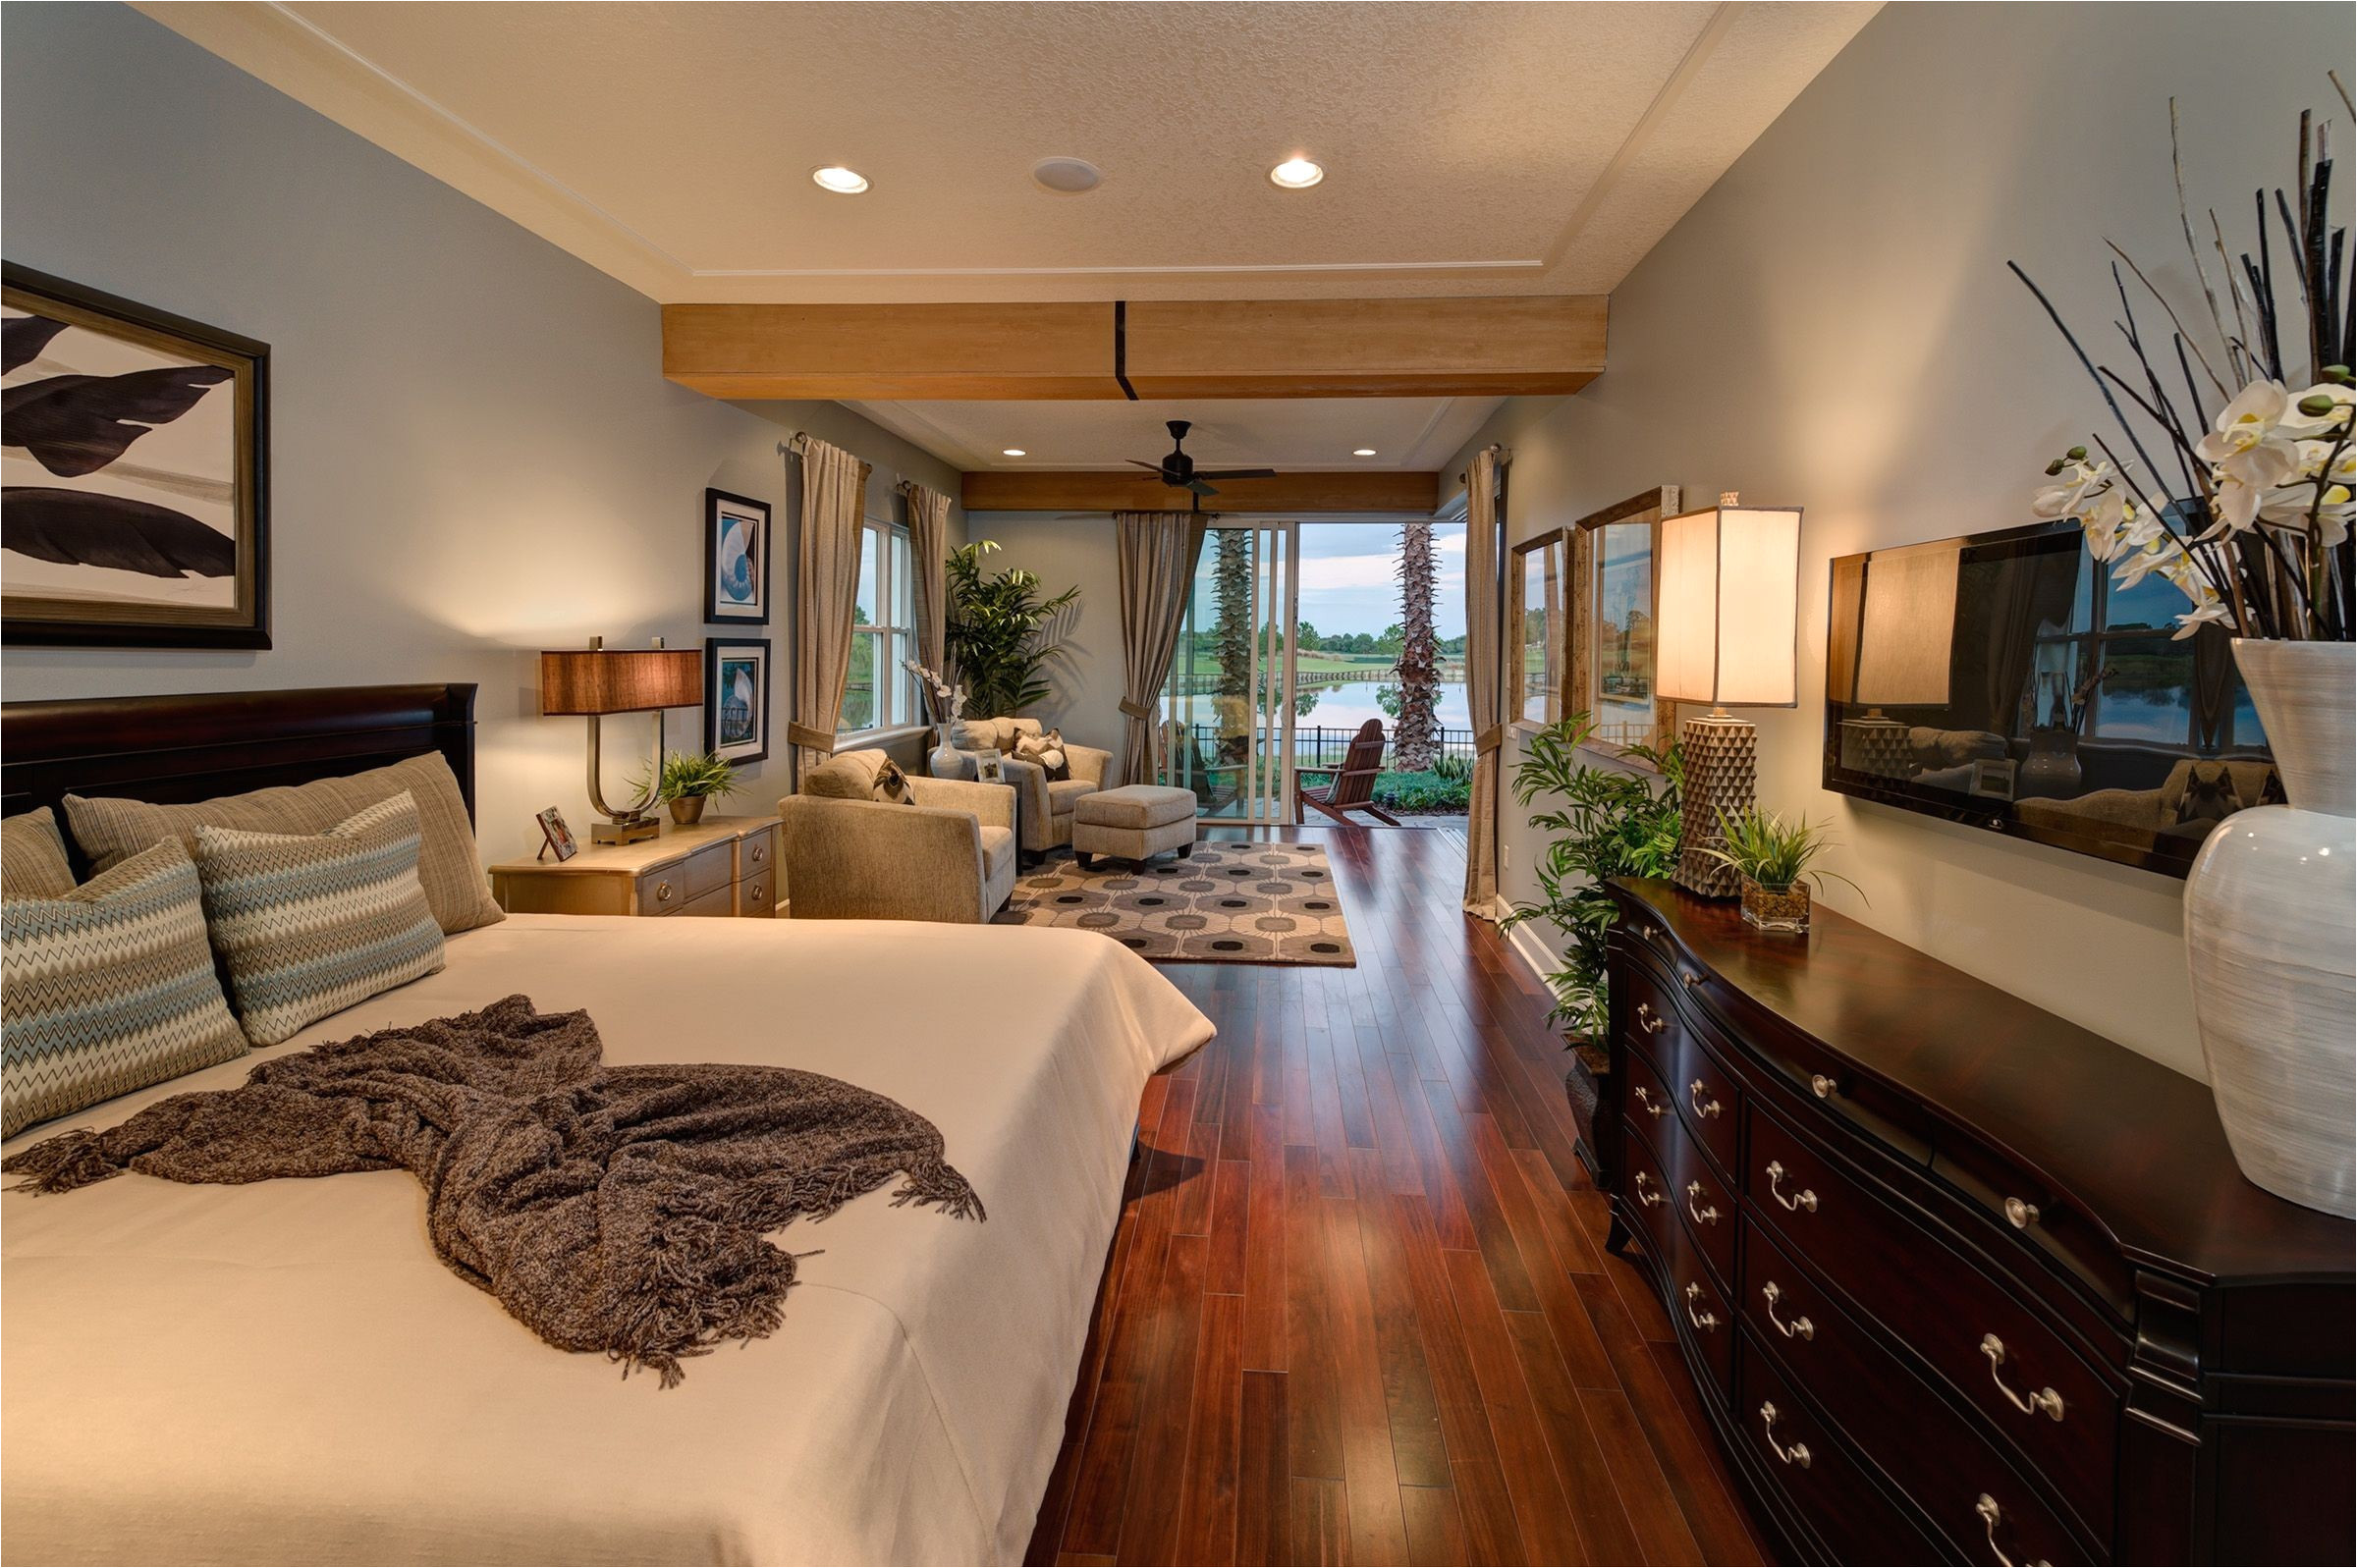 3 bedroom resorts in orlando florida extraordinary the gen x master rh bedroomsets site 3 bedroom